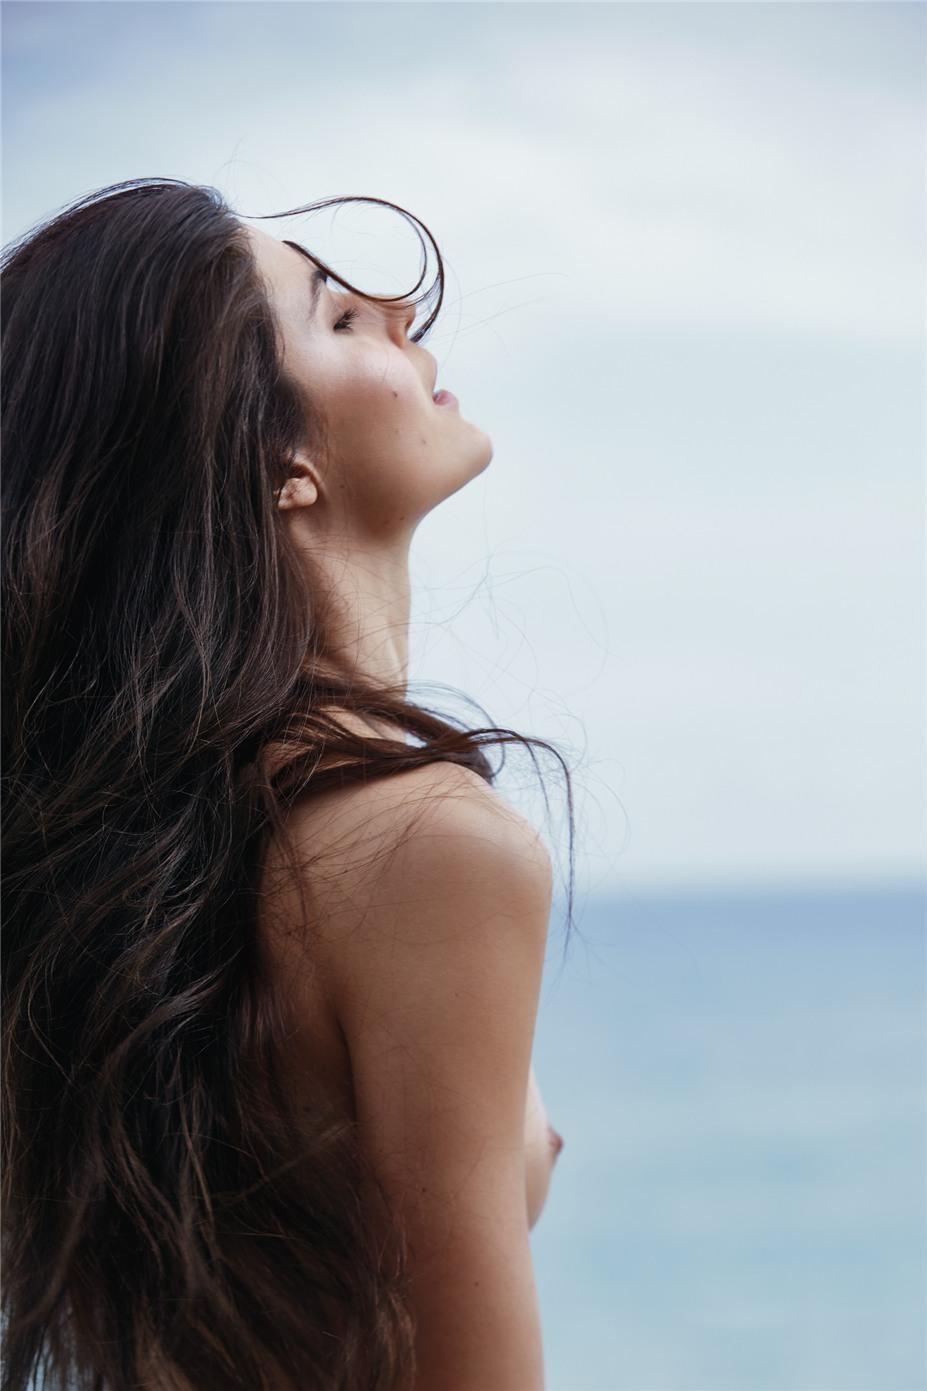 Обнаженные девушки на пляжах Ибицы / Ibiza Nudes by Diane Betties - Lina